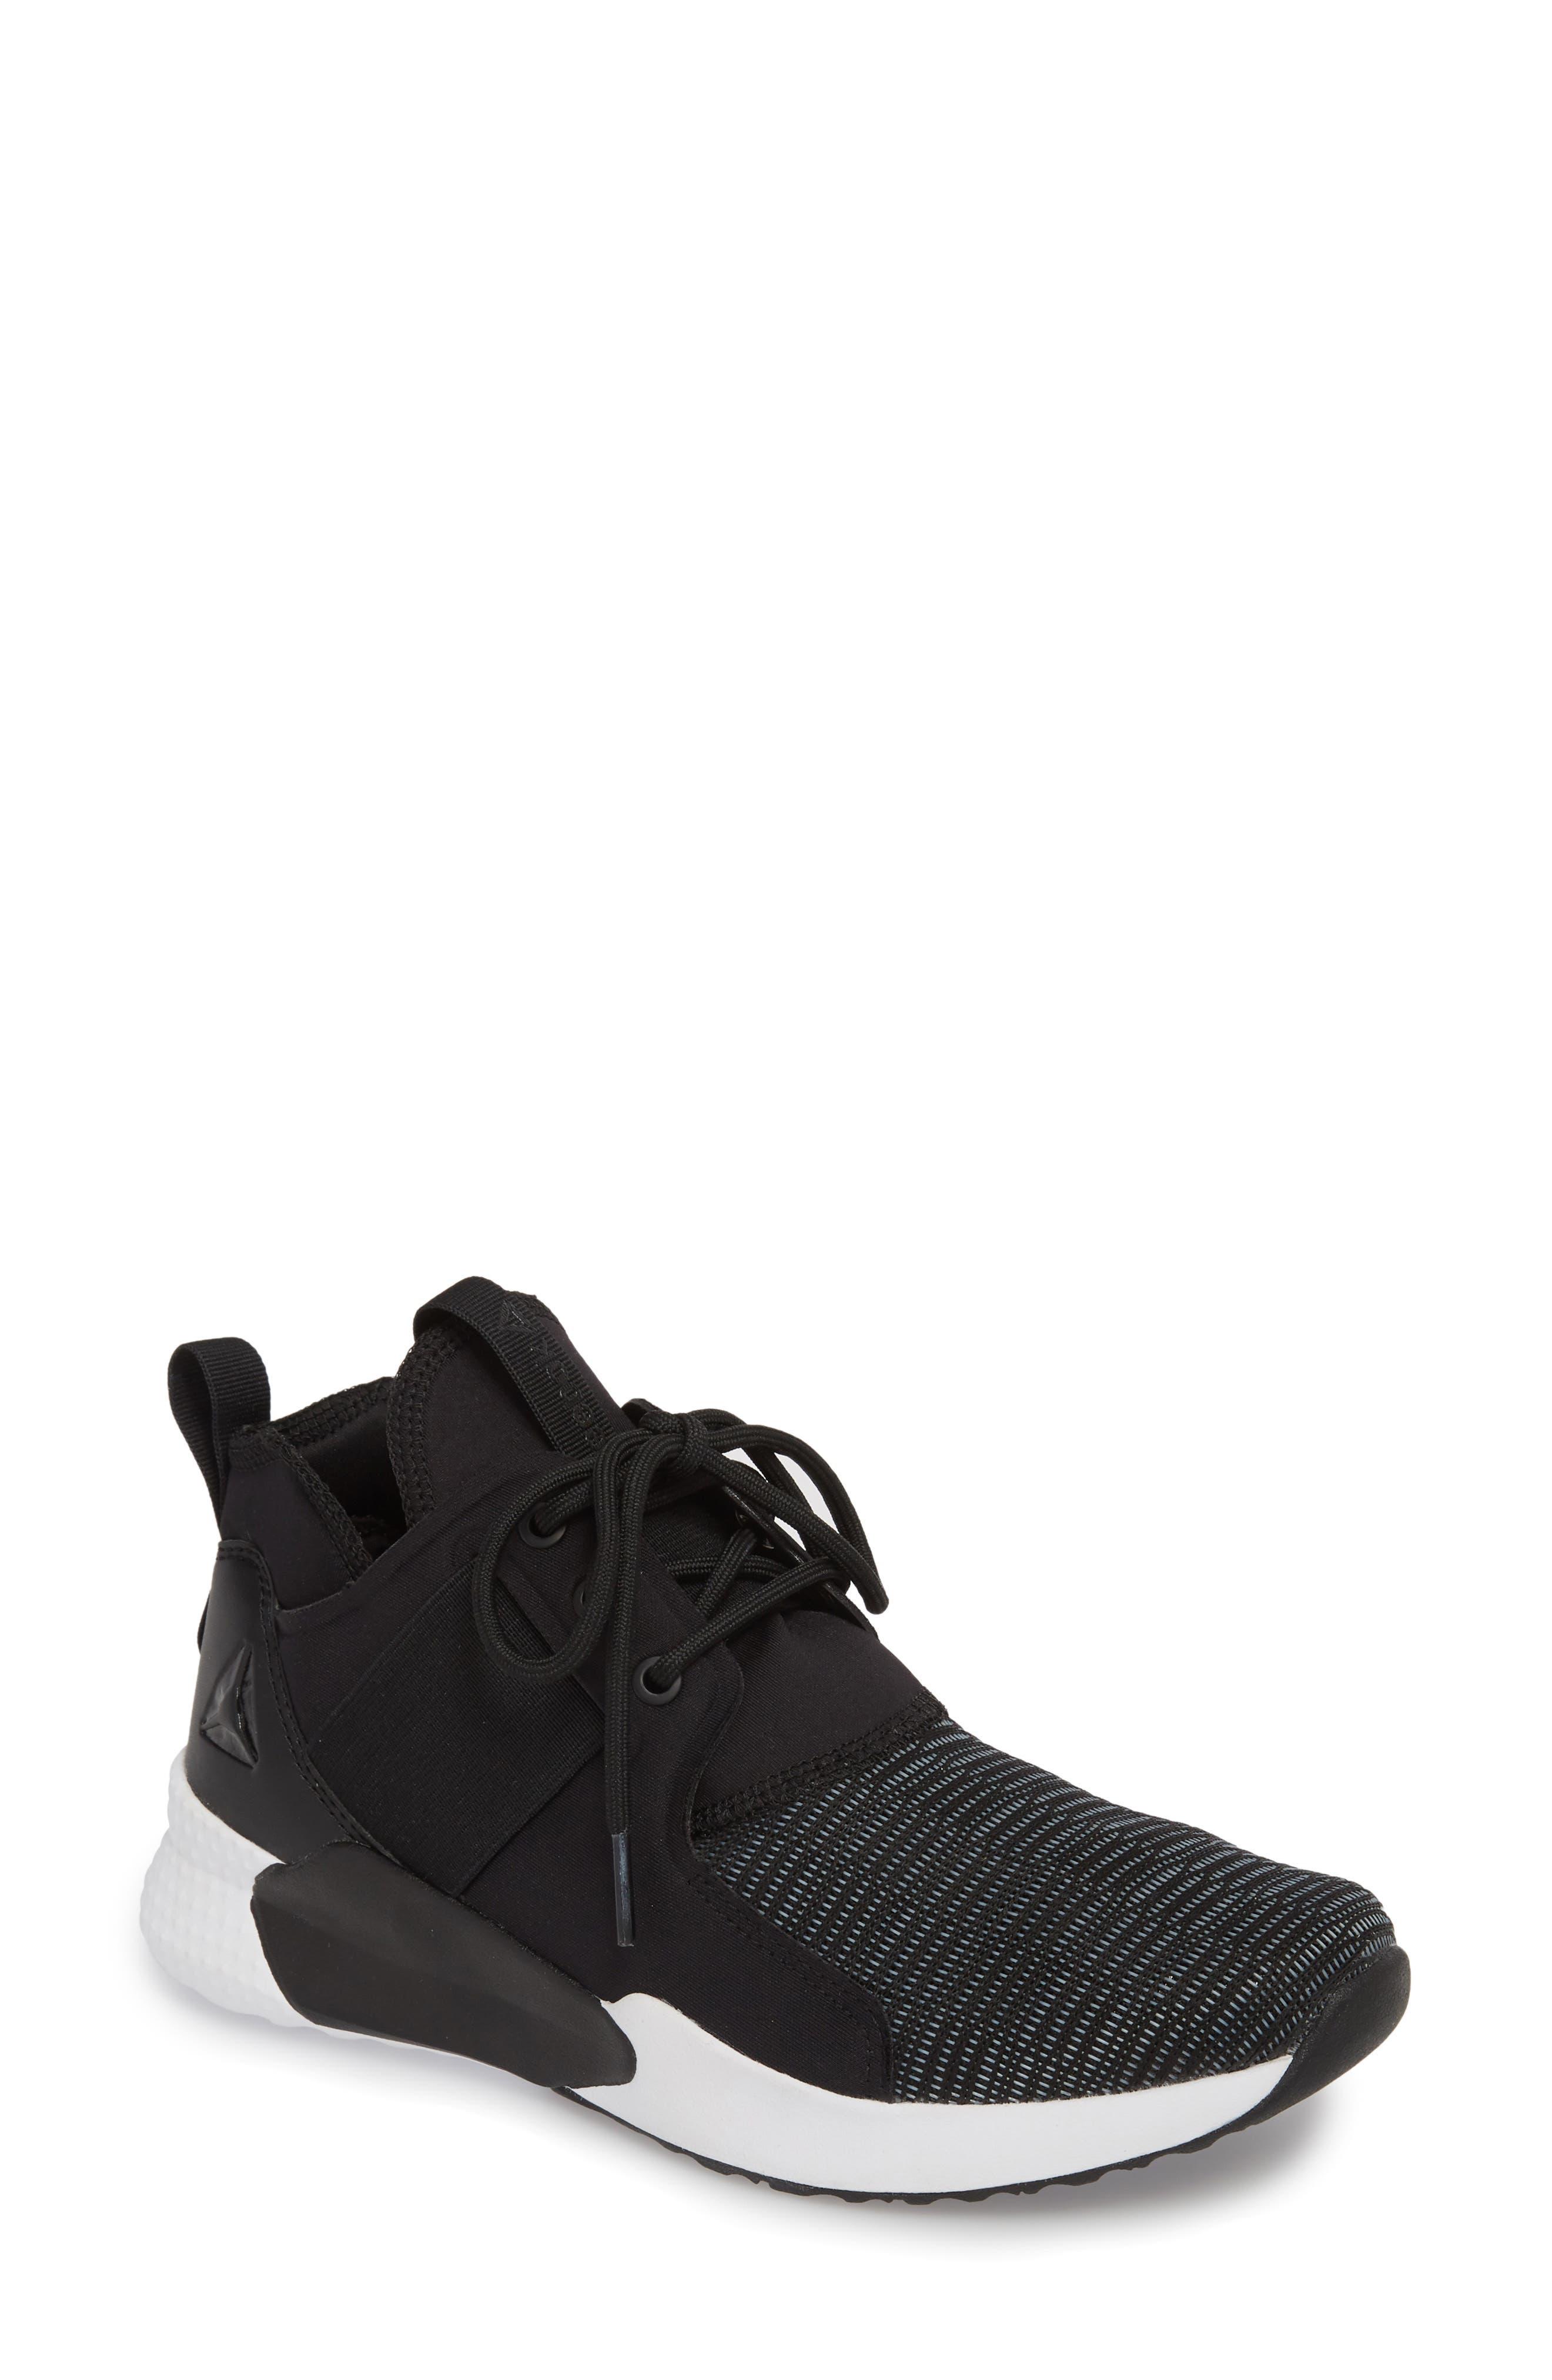 Guresu 1.0 High Top Sneaker,                             Main thumbnail 1, color,                             Black/ White